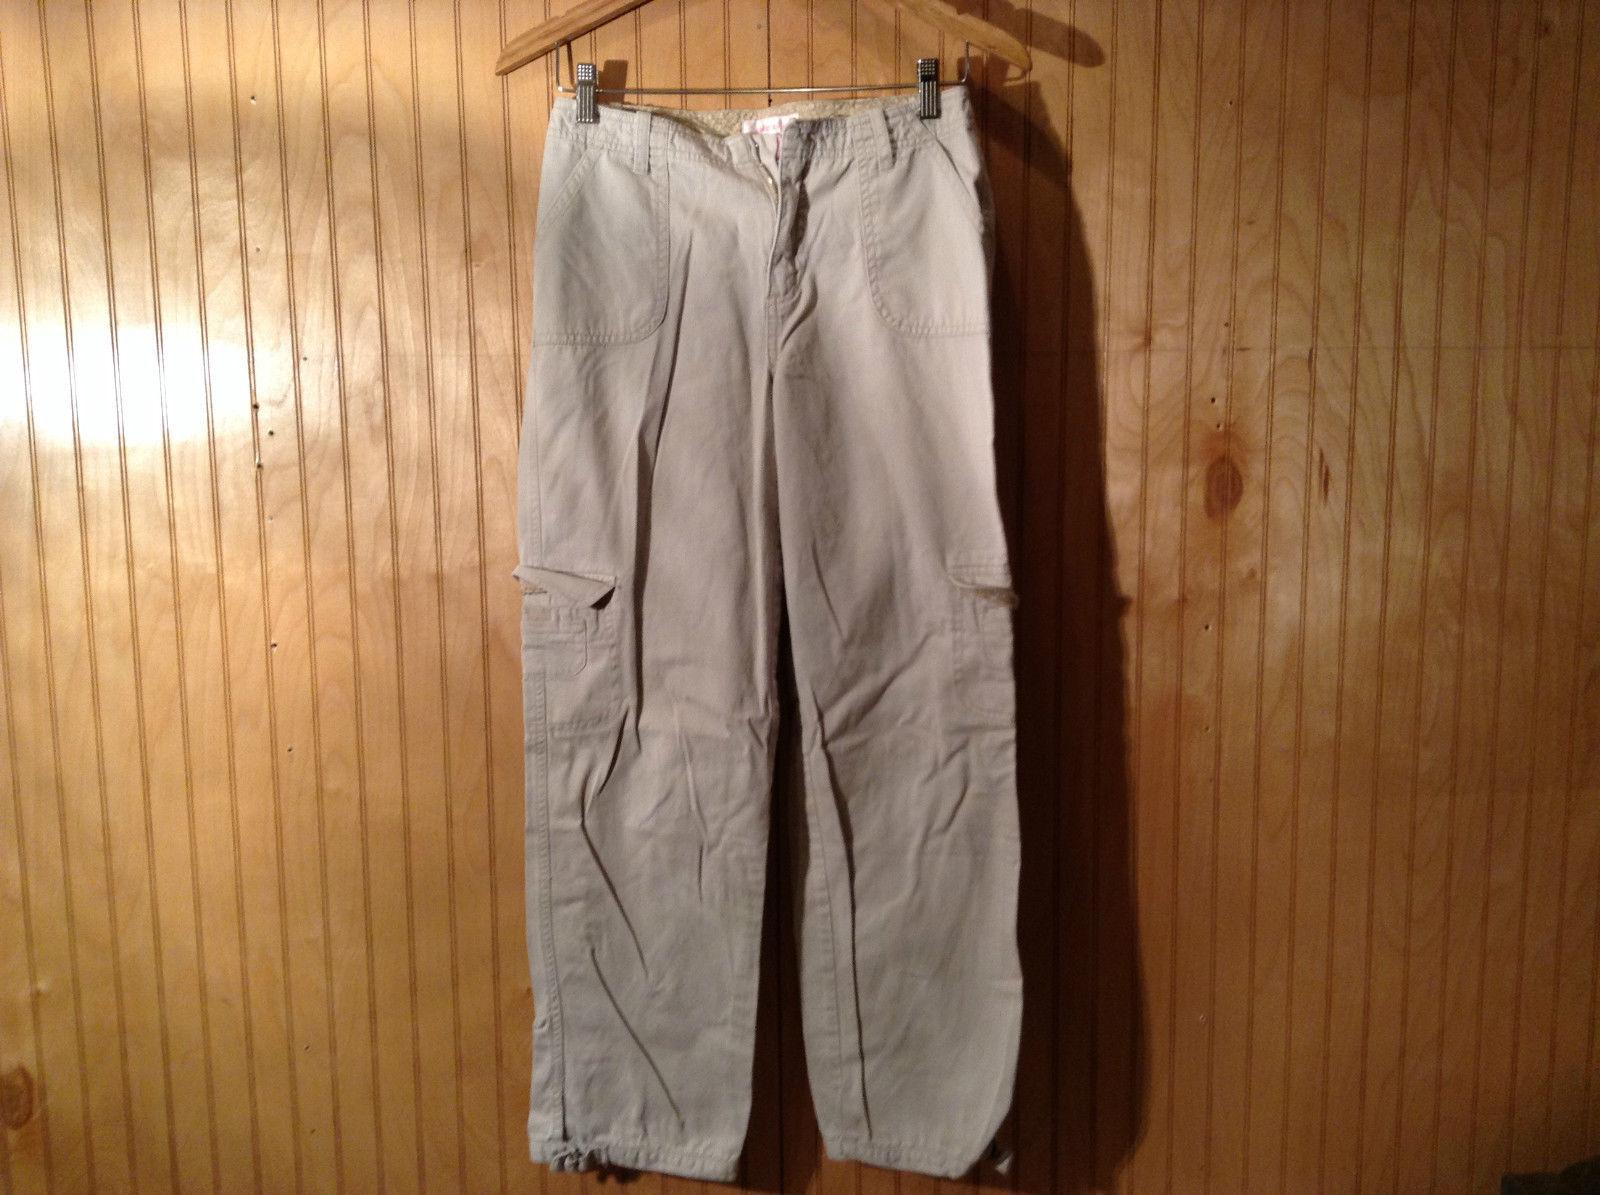 Xhilaration Size XL Khaki Beige Cargo Casual Pants 100 Percent Cotton